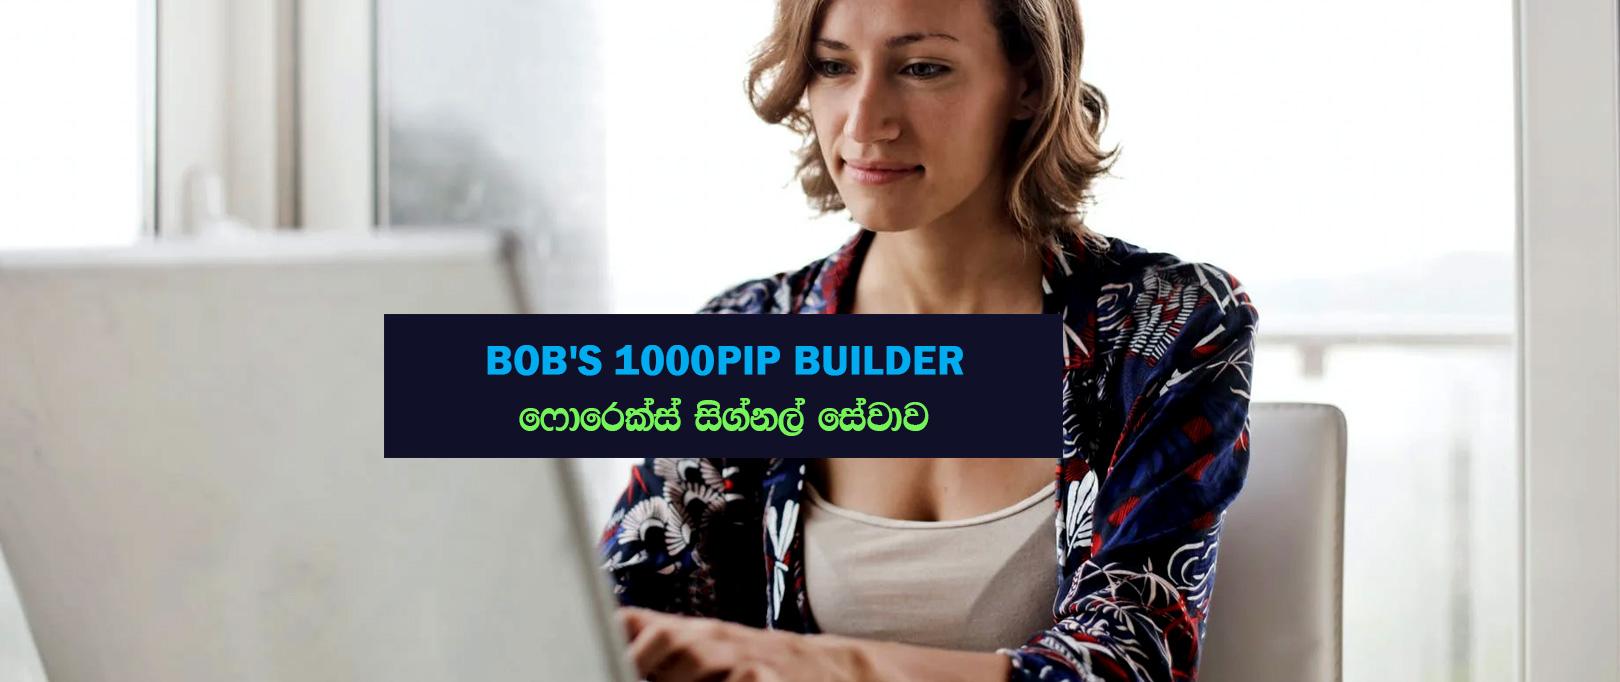 Bobs's 1000 Pip Builder – Premium Forex Signal Provider Review – Sinhala Sri Lanka